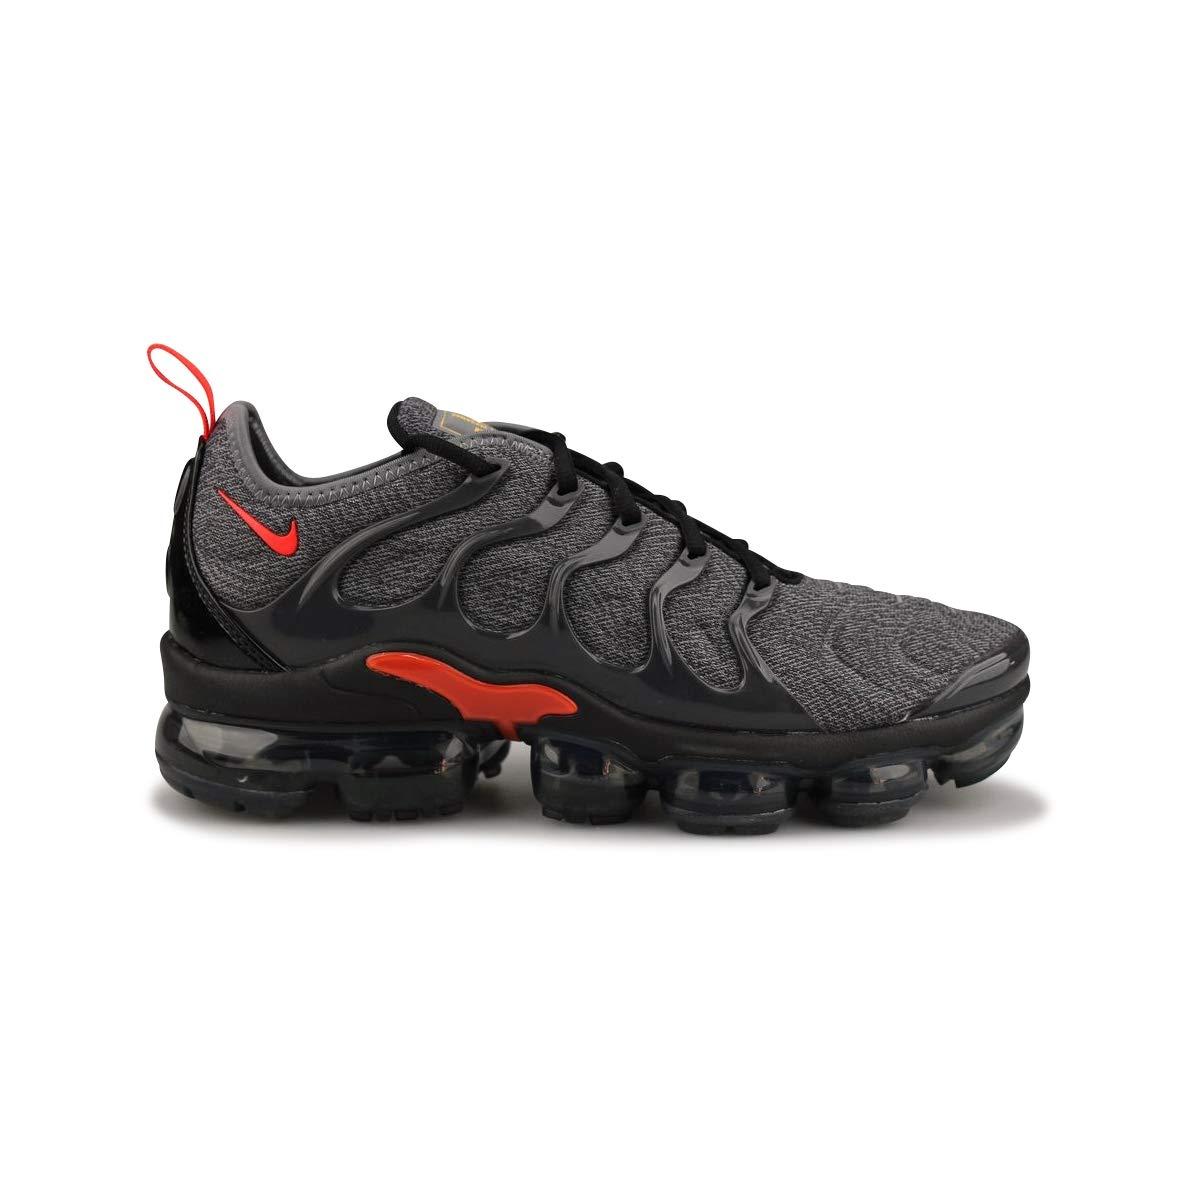 c3fbadc6e7 Galleon - Nike Air Vapormax Plus Mens Style: 924453-012 Size: 11